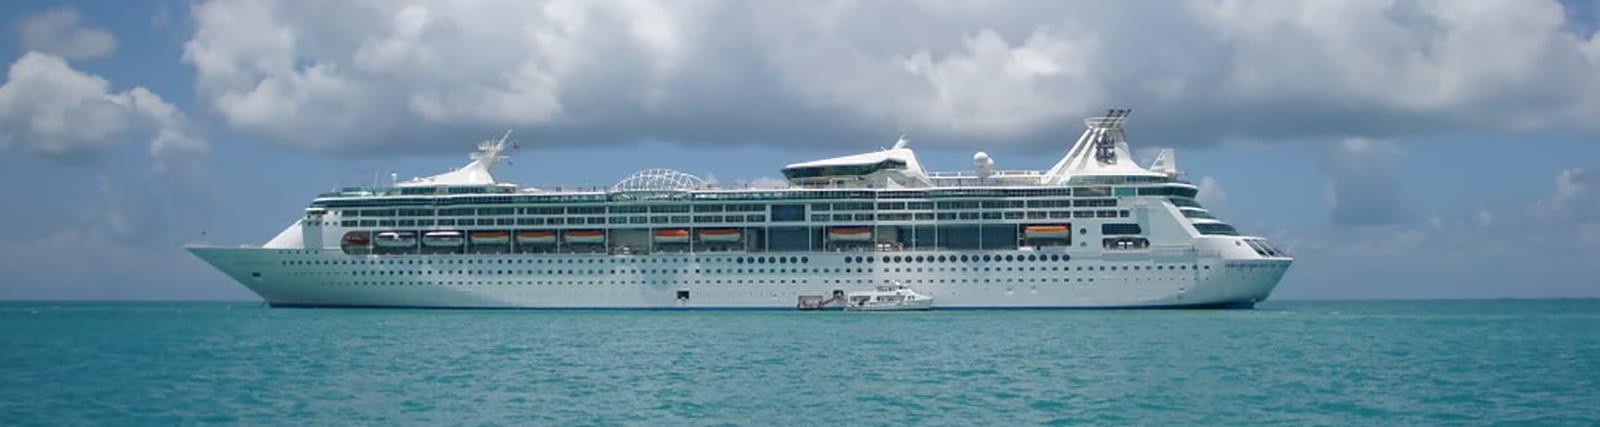 Enchantment of the seas cruises